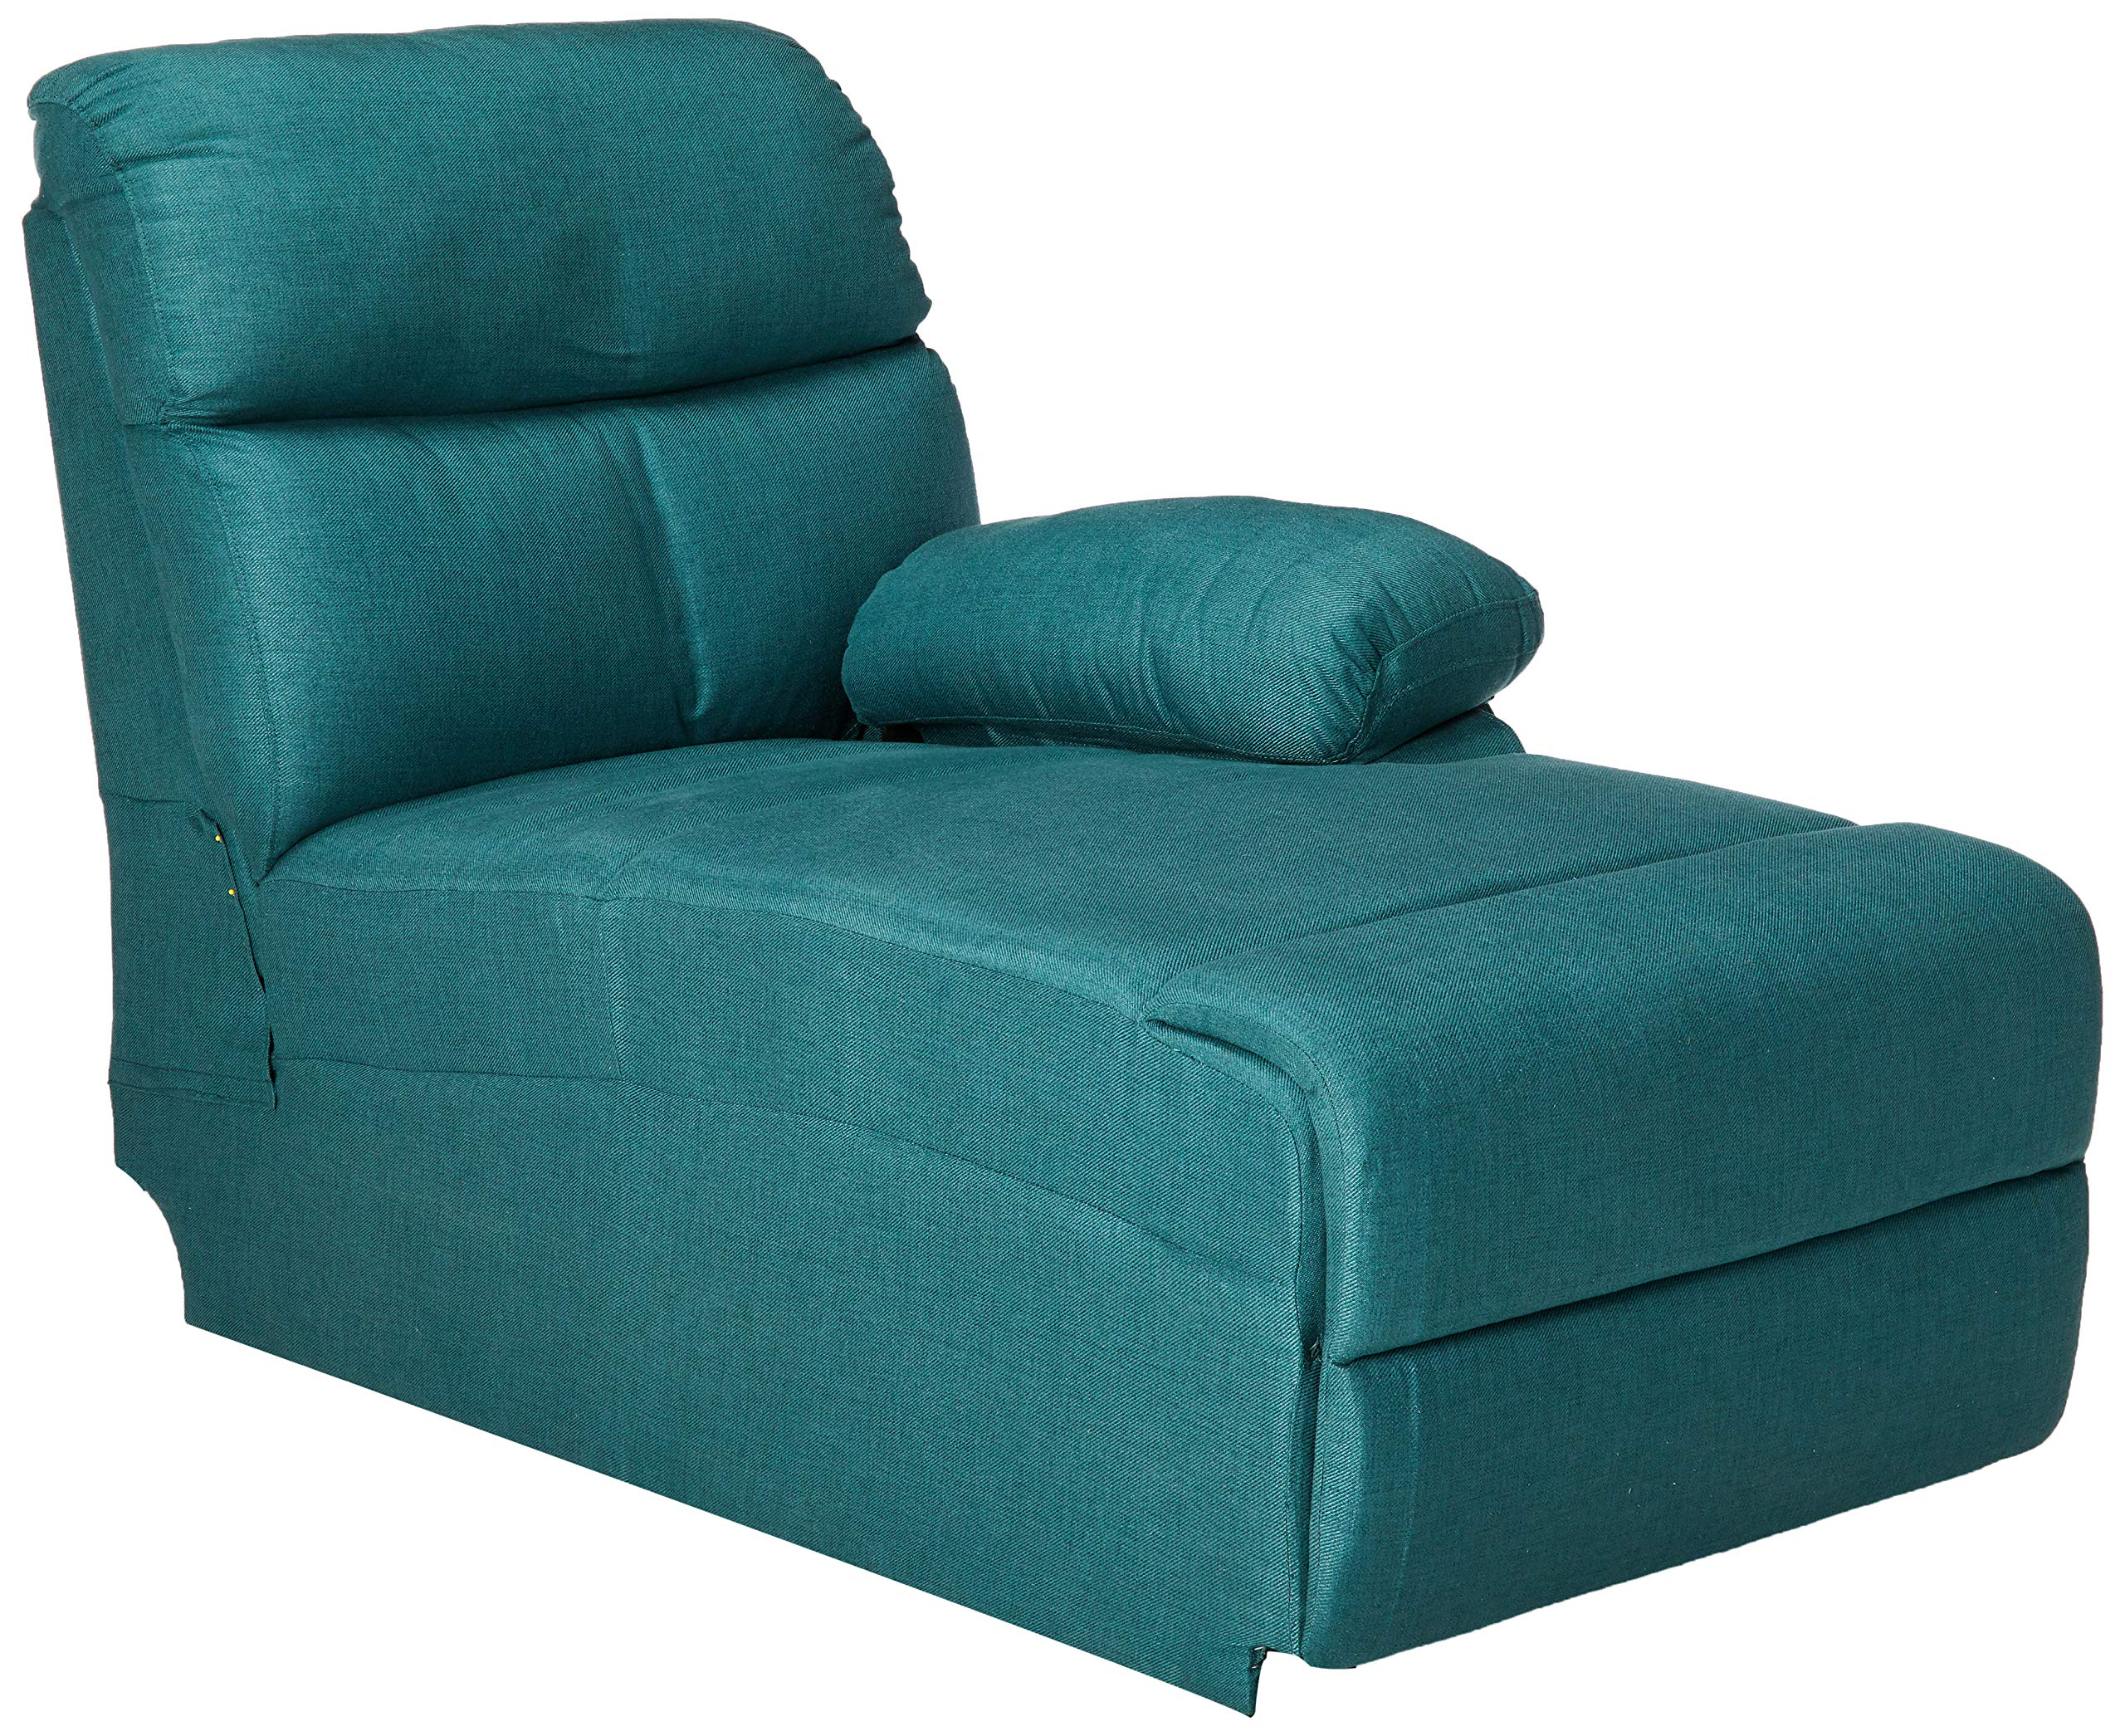 Christopher Knight Home Susana Comfort Modern Fabric Chaise (Dark Teal) by Christopher Knight Home